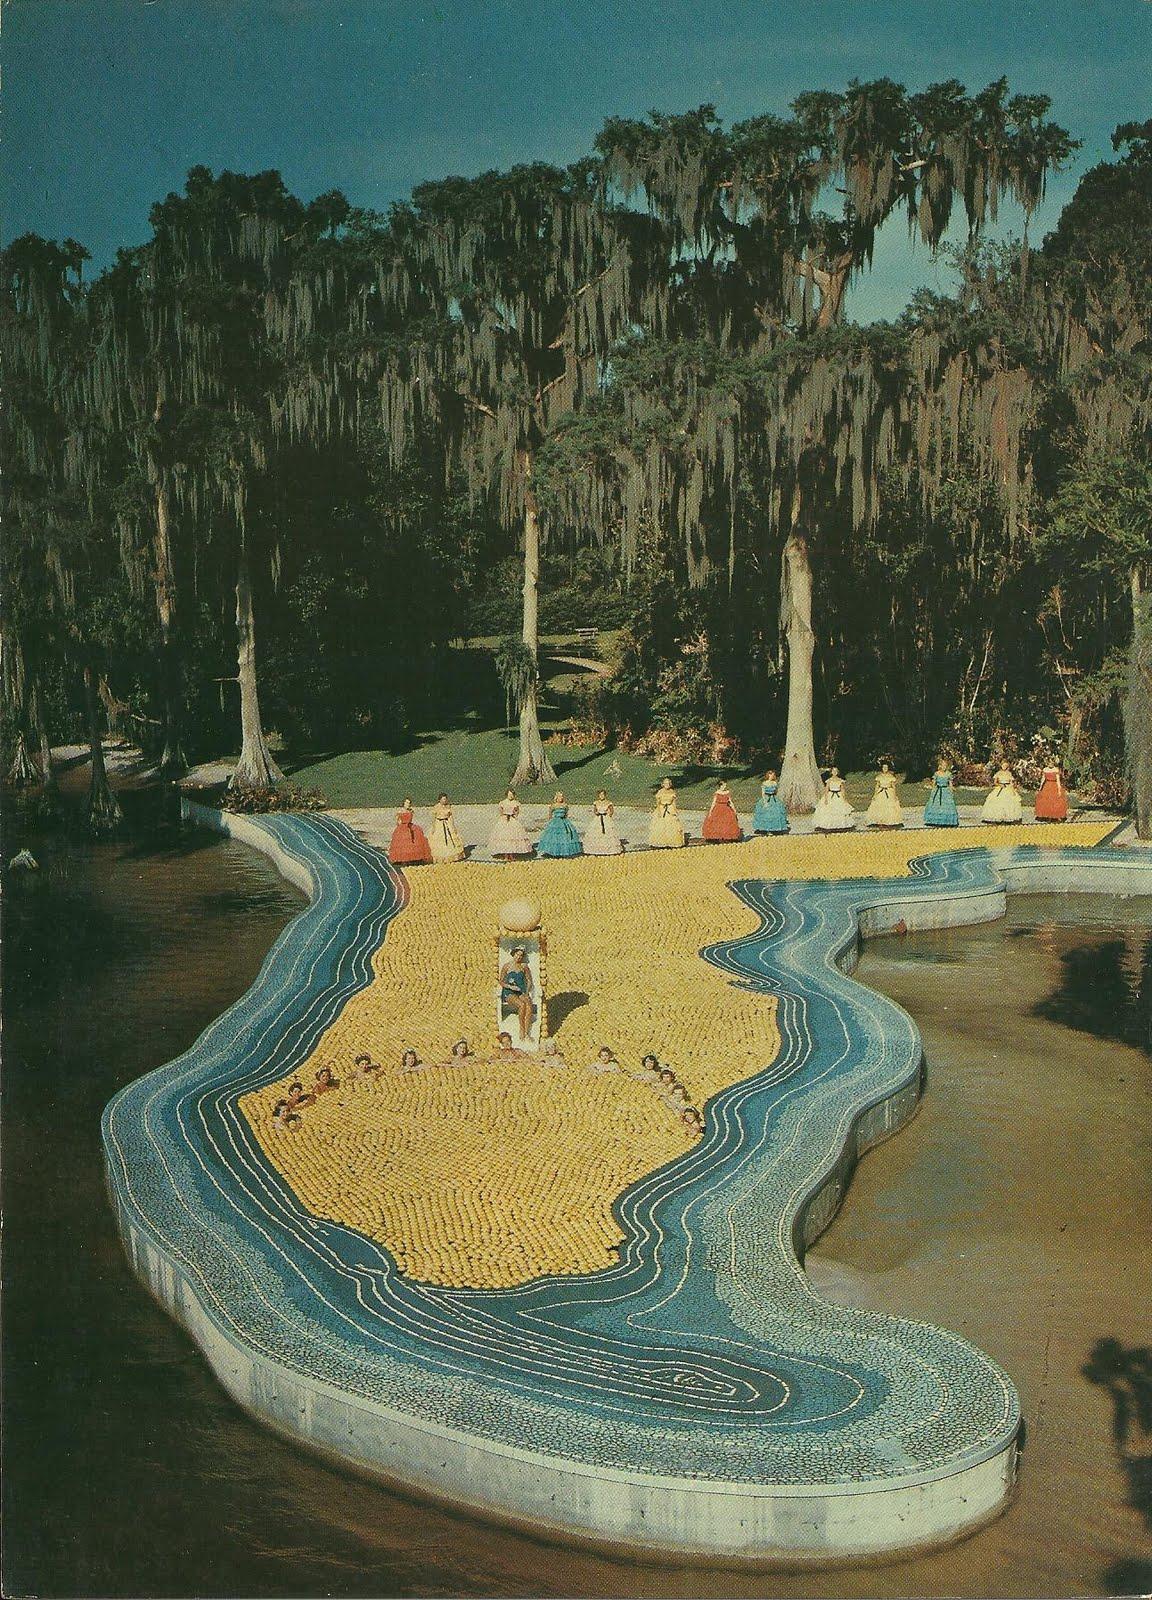 Vintage Travel Postcards Cypress Gardens